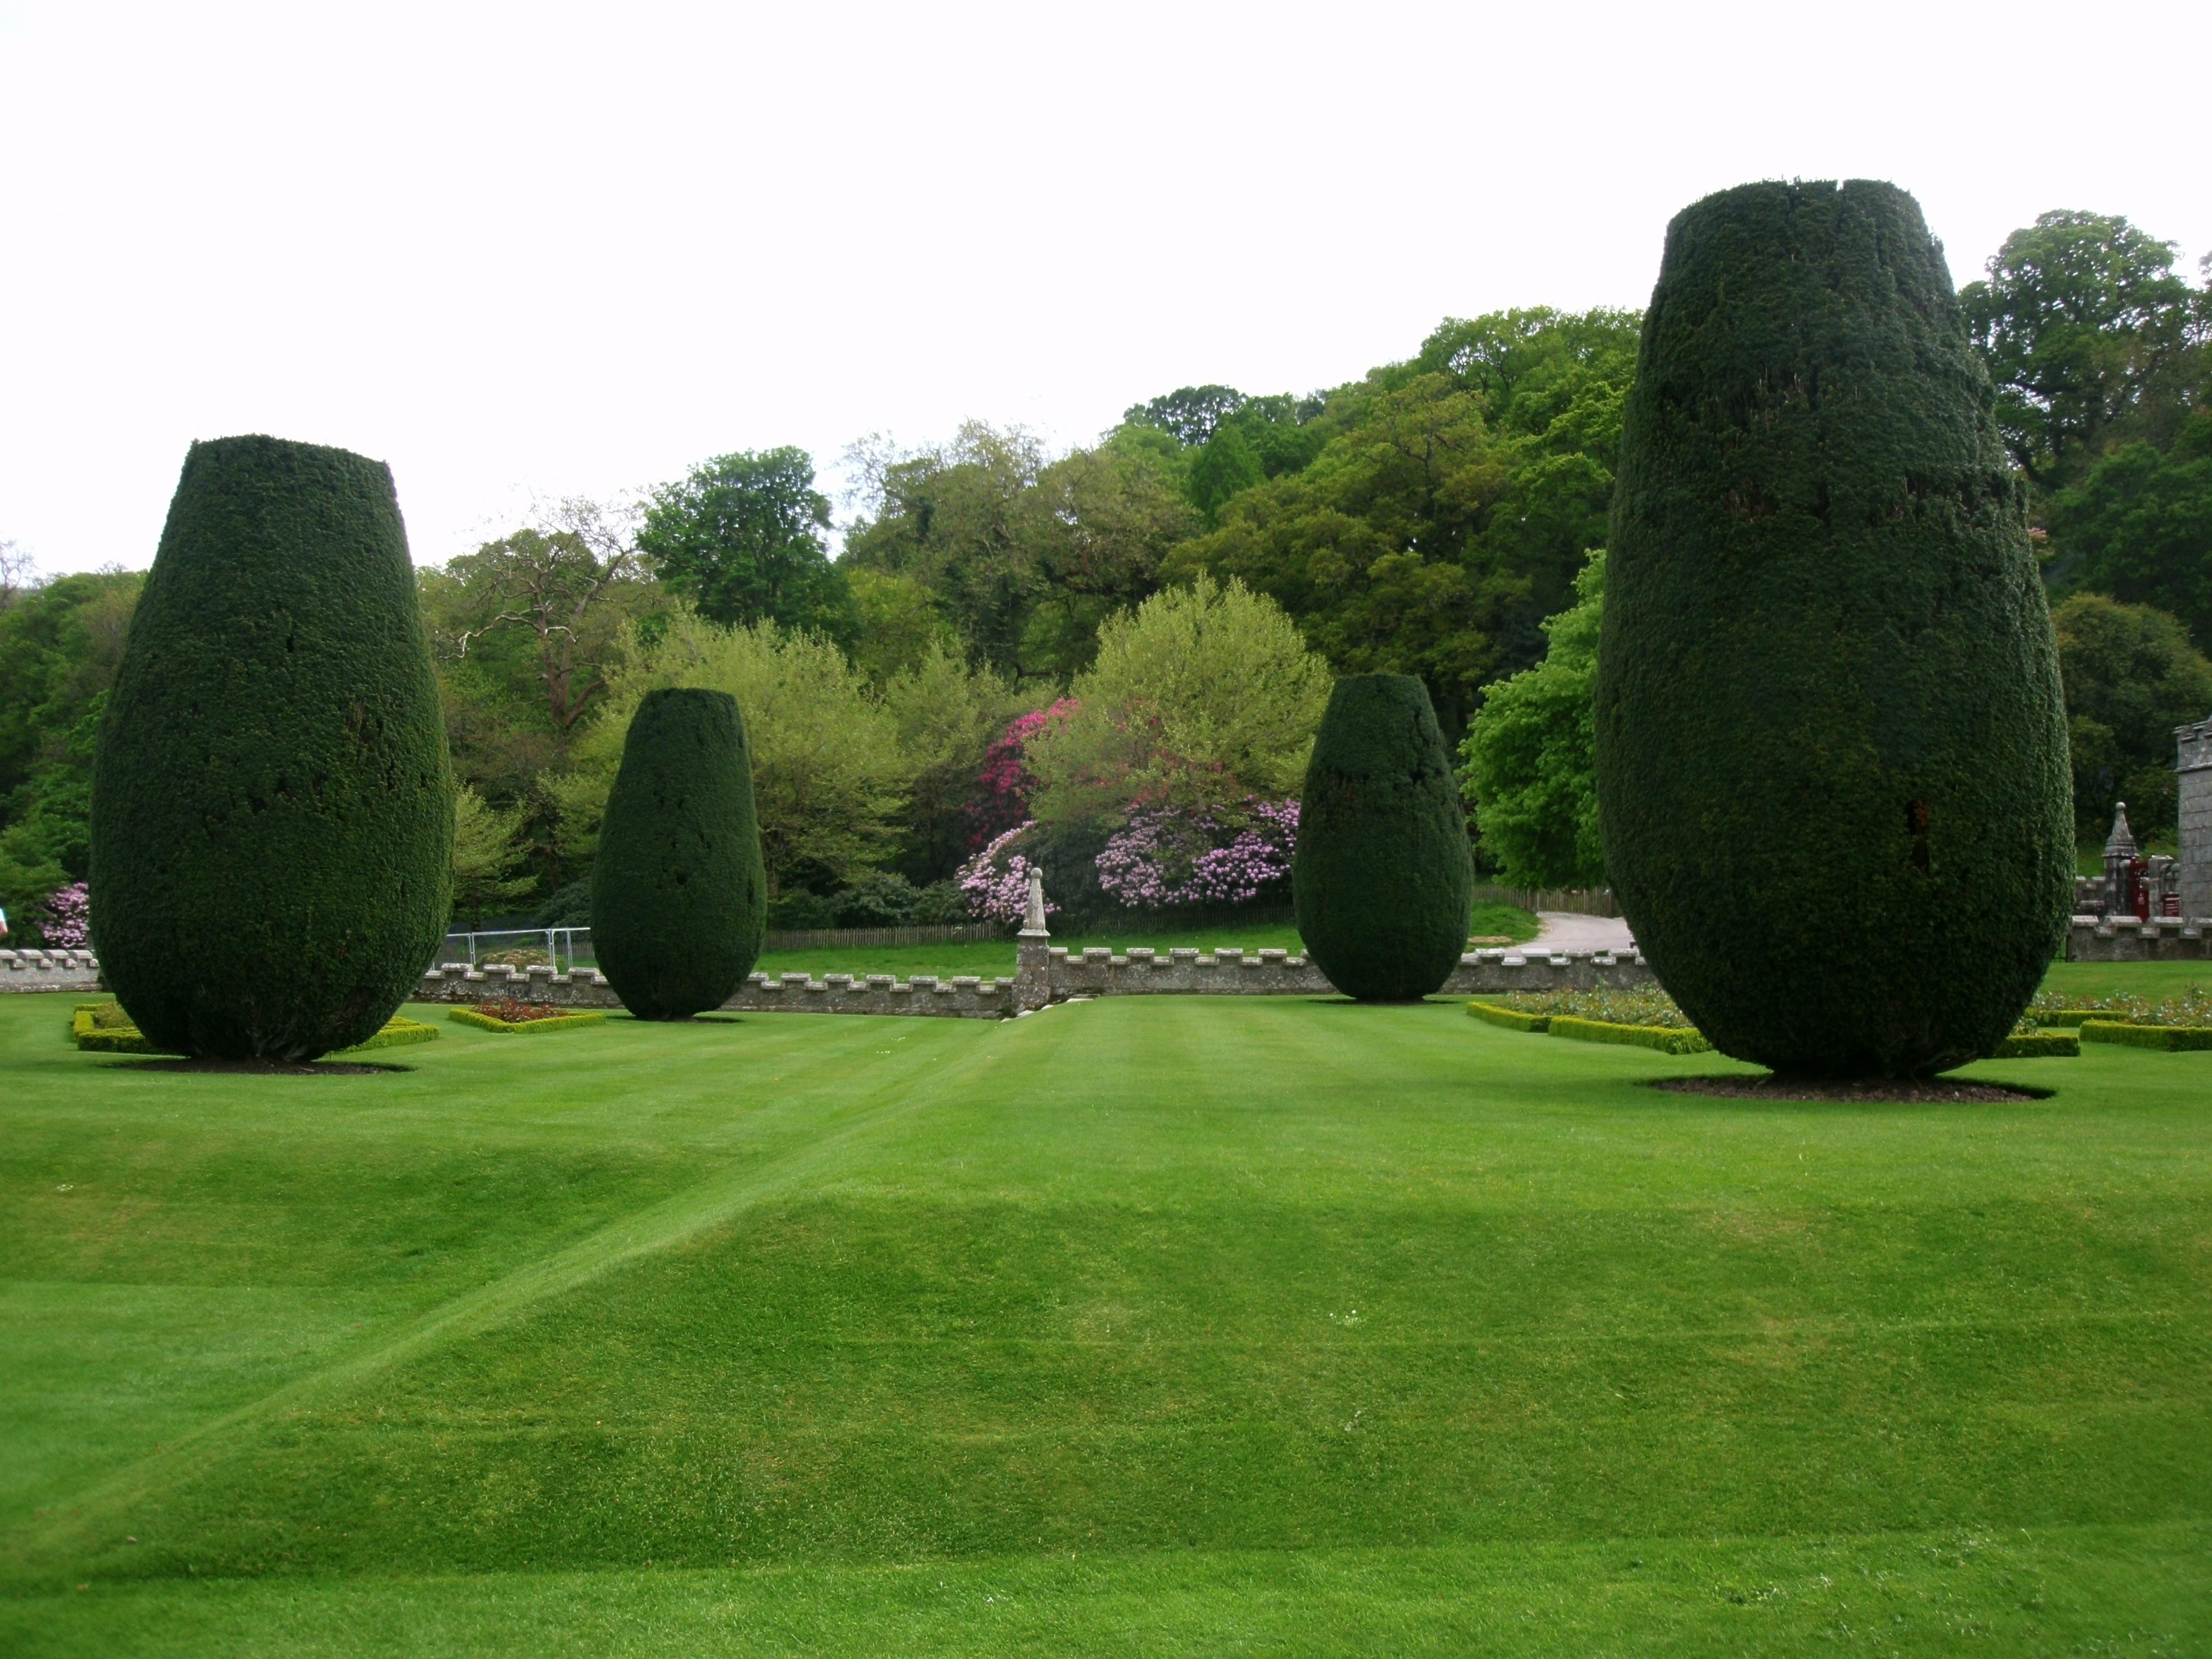 Fotos gratis rbol c sped estructura planta verde for Jardin ingles